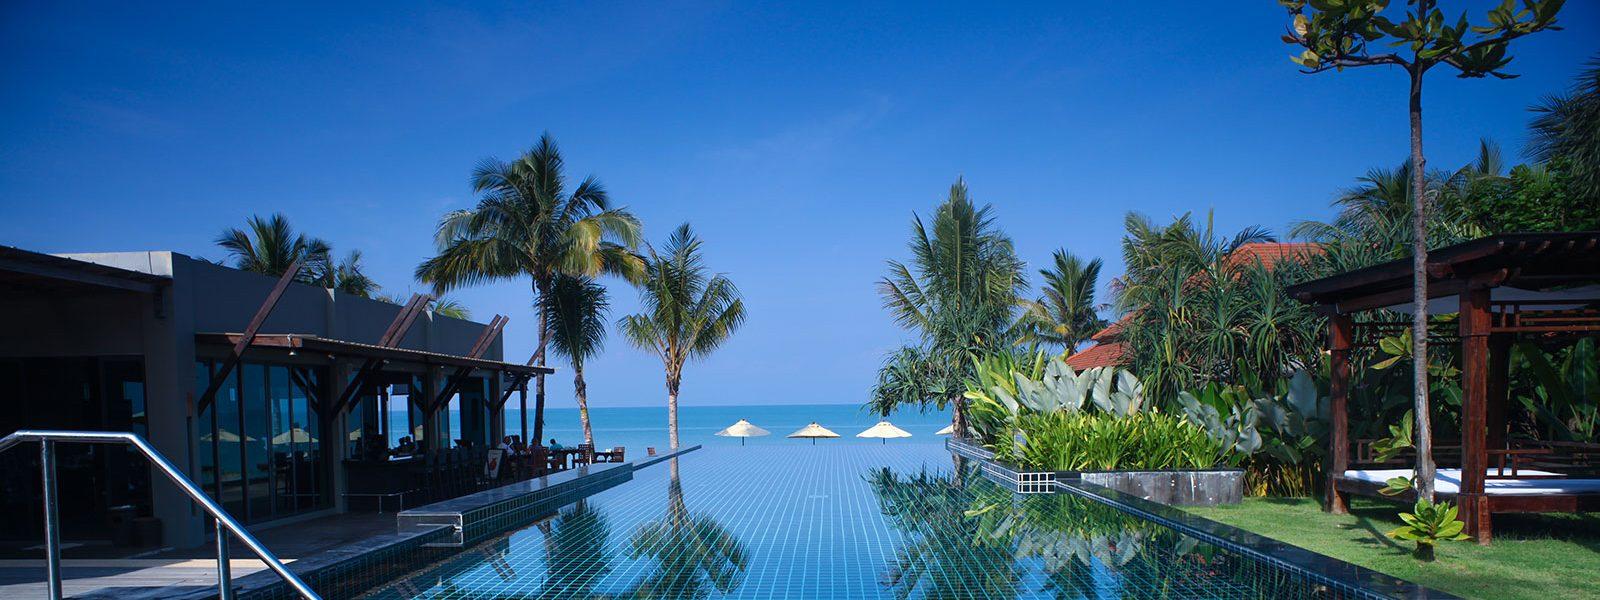 Chongfah Resort Khao Lak - Rates & Reservations